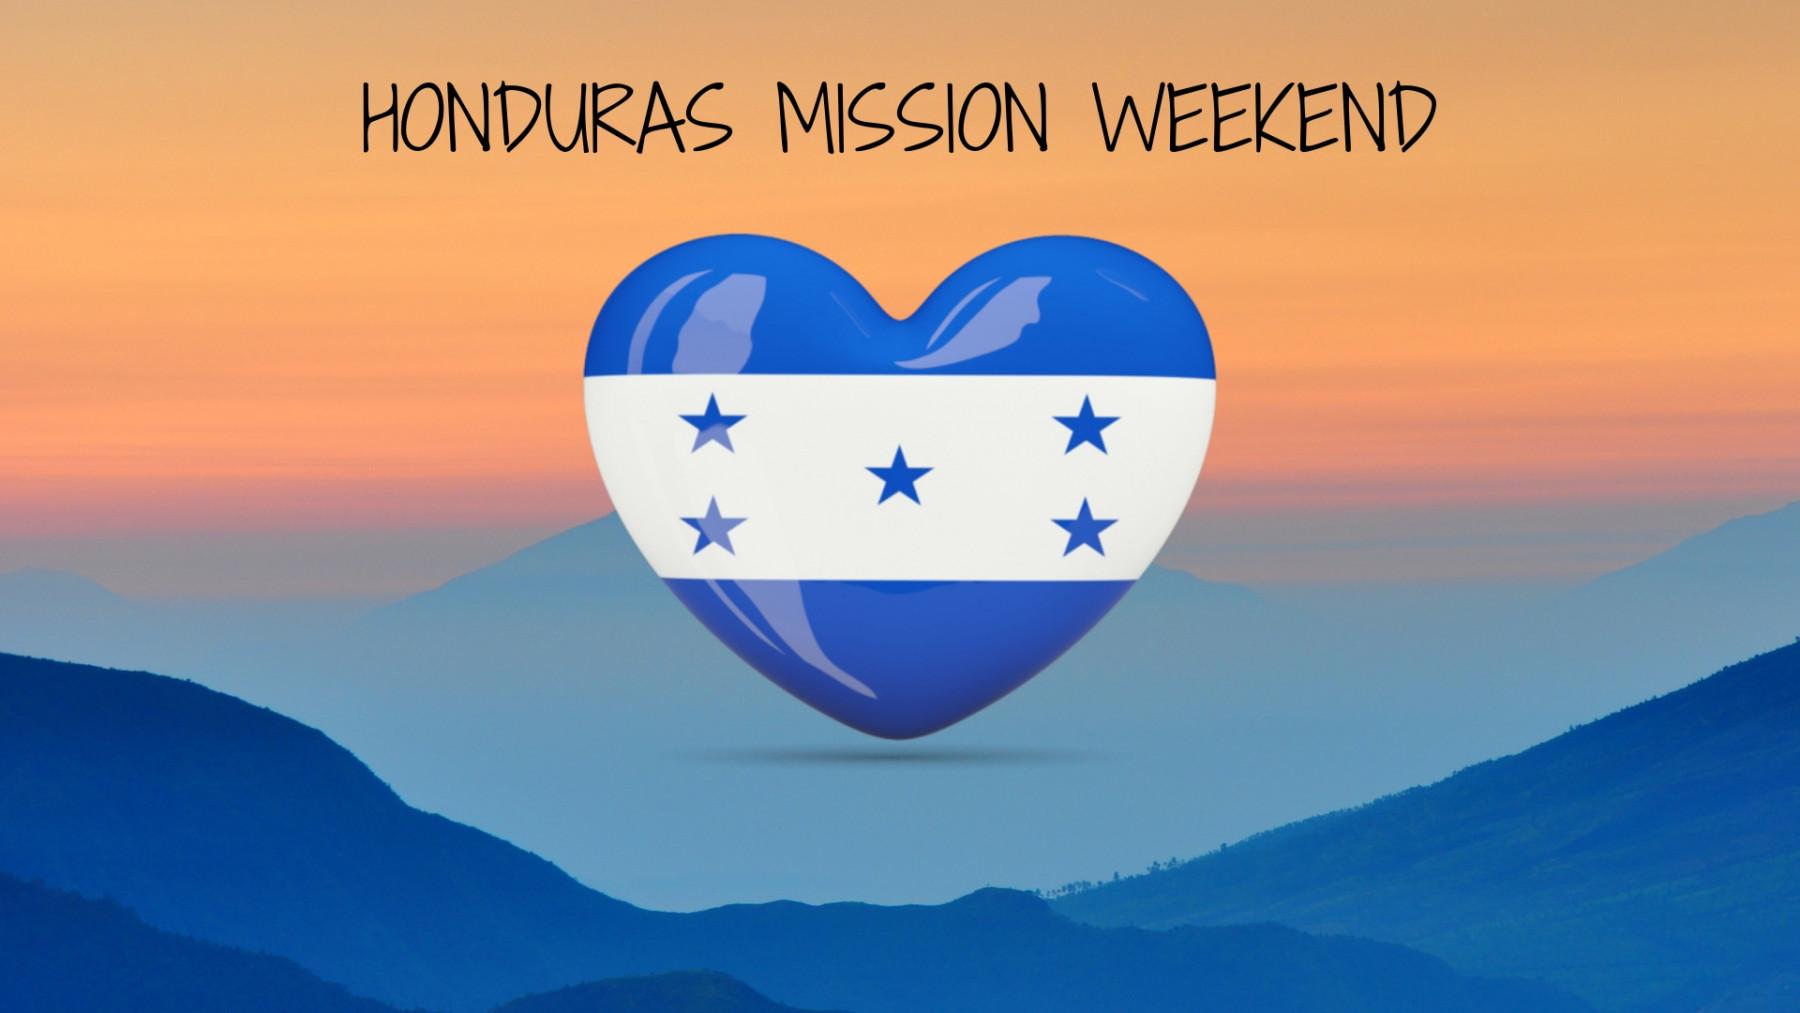 Honduras Mission Weekend